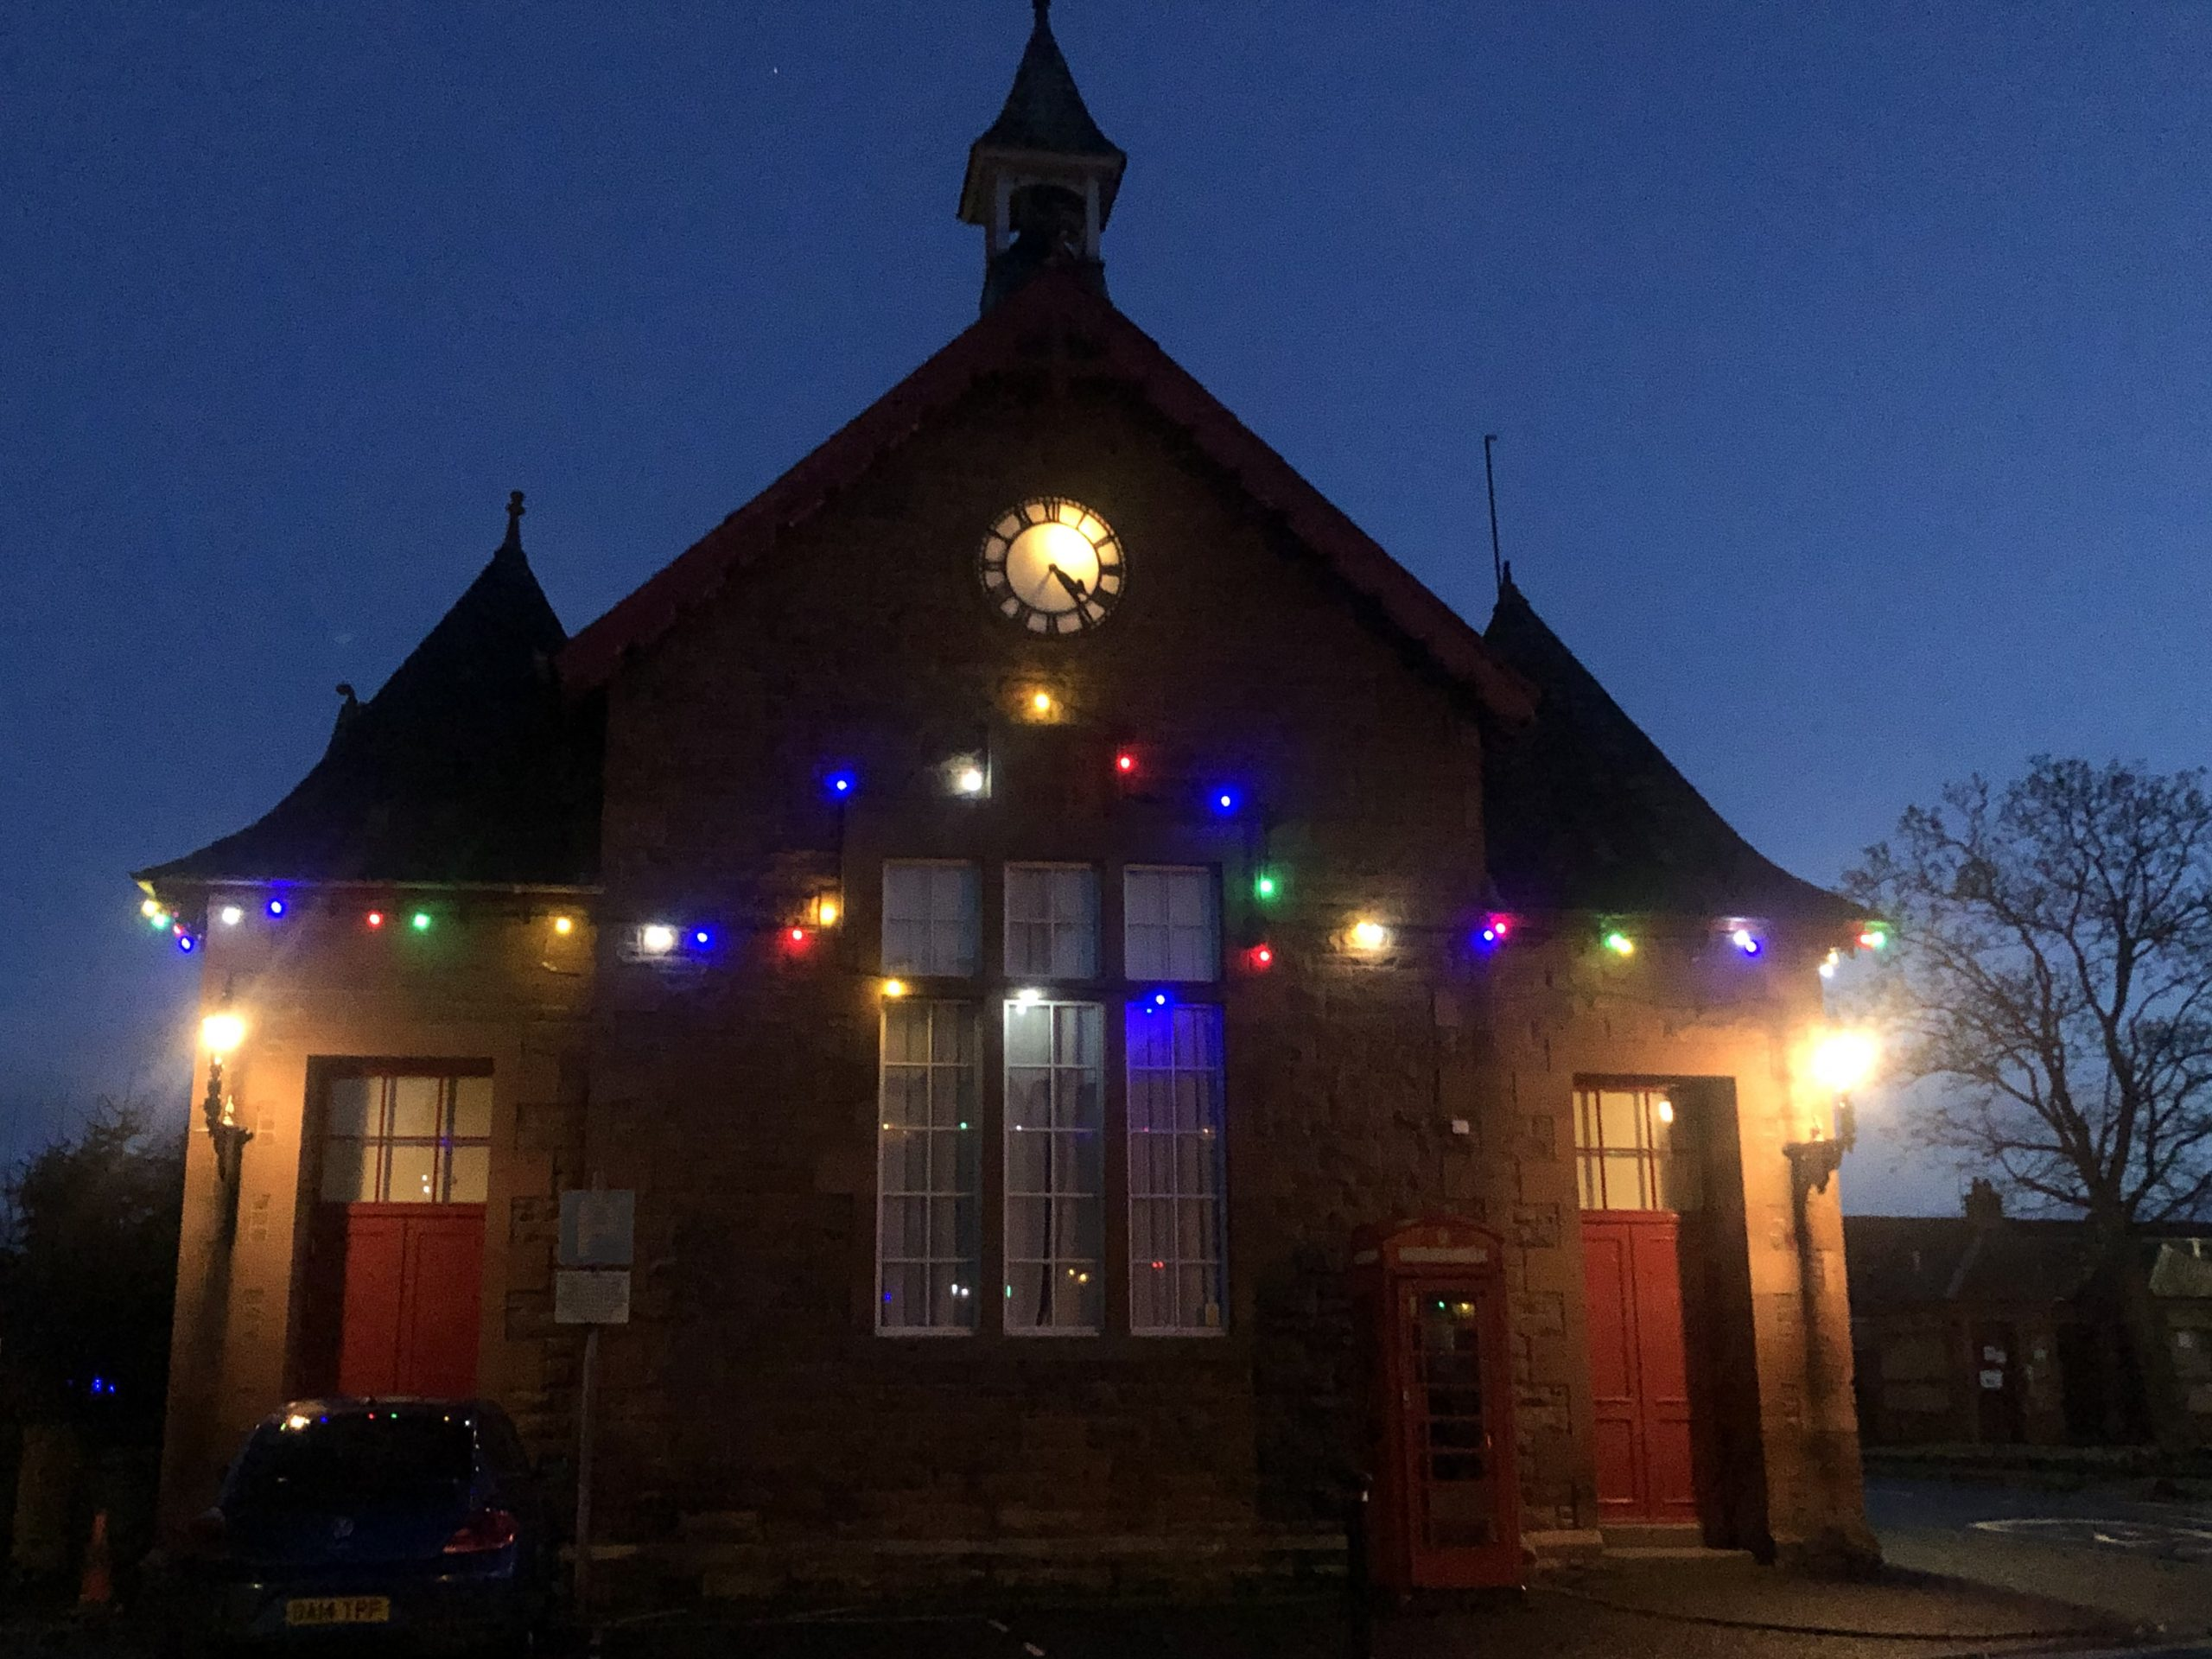 Hall lights, Dec.20